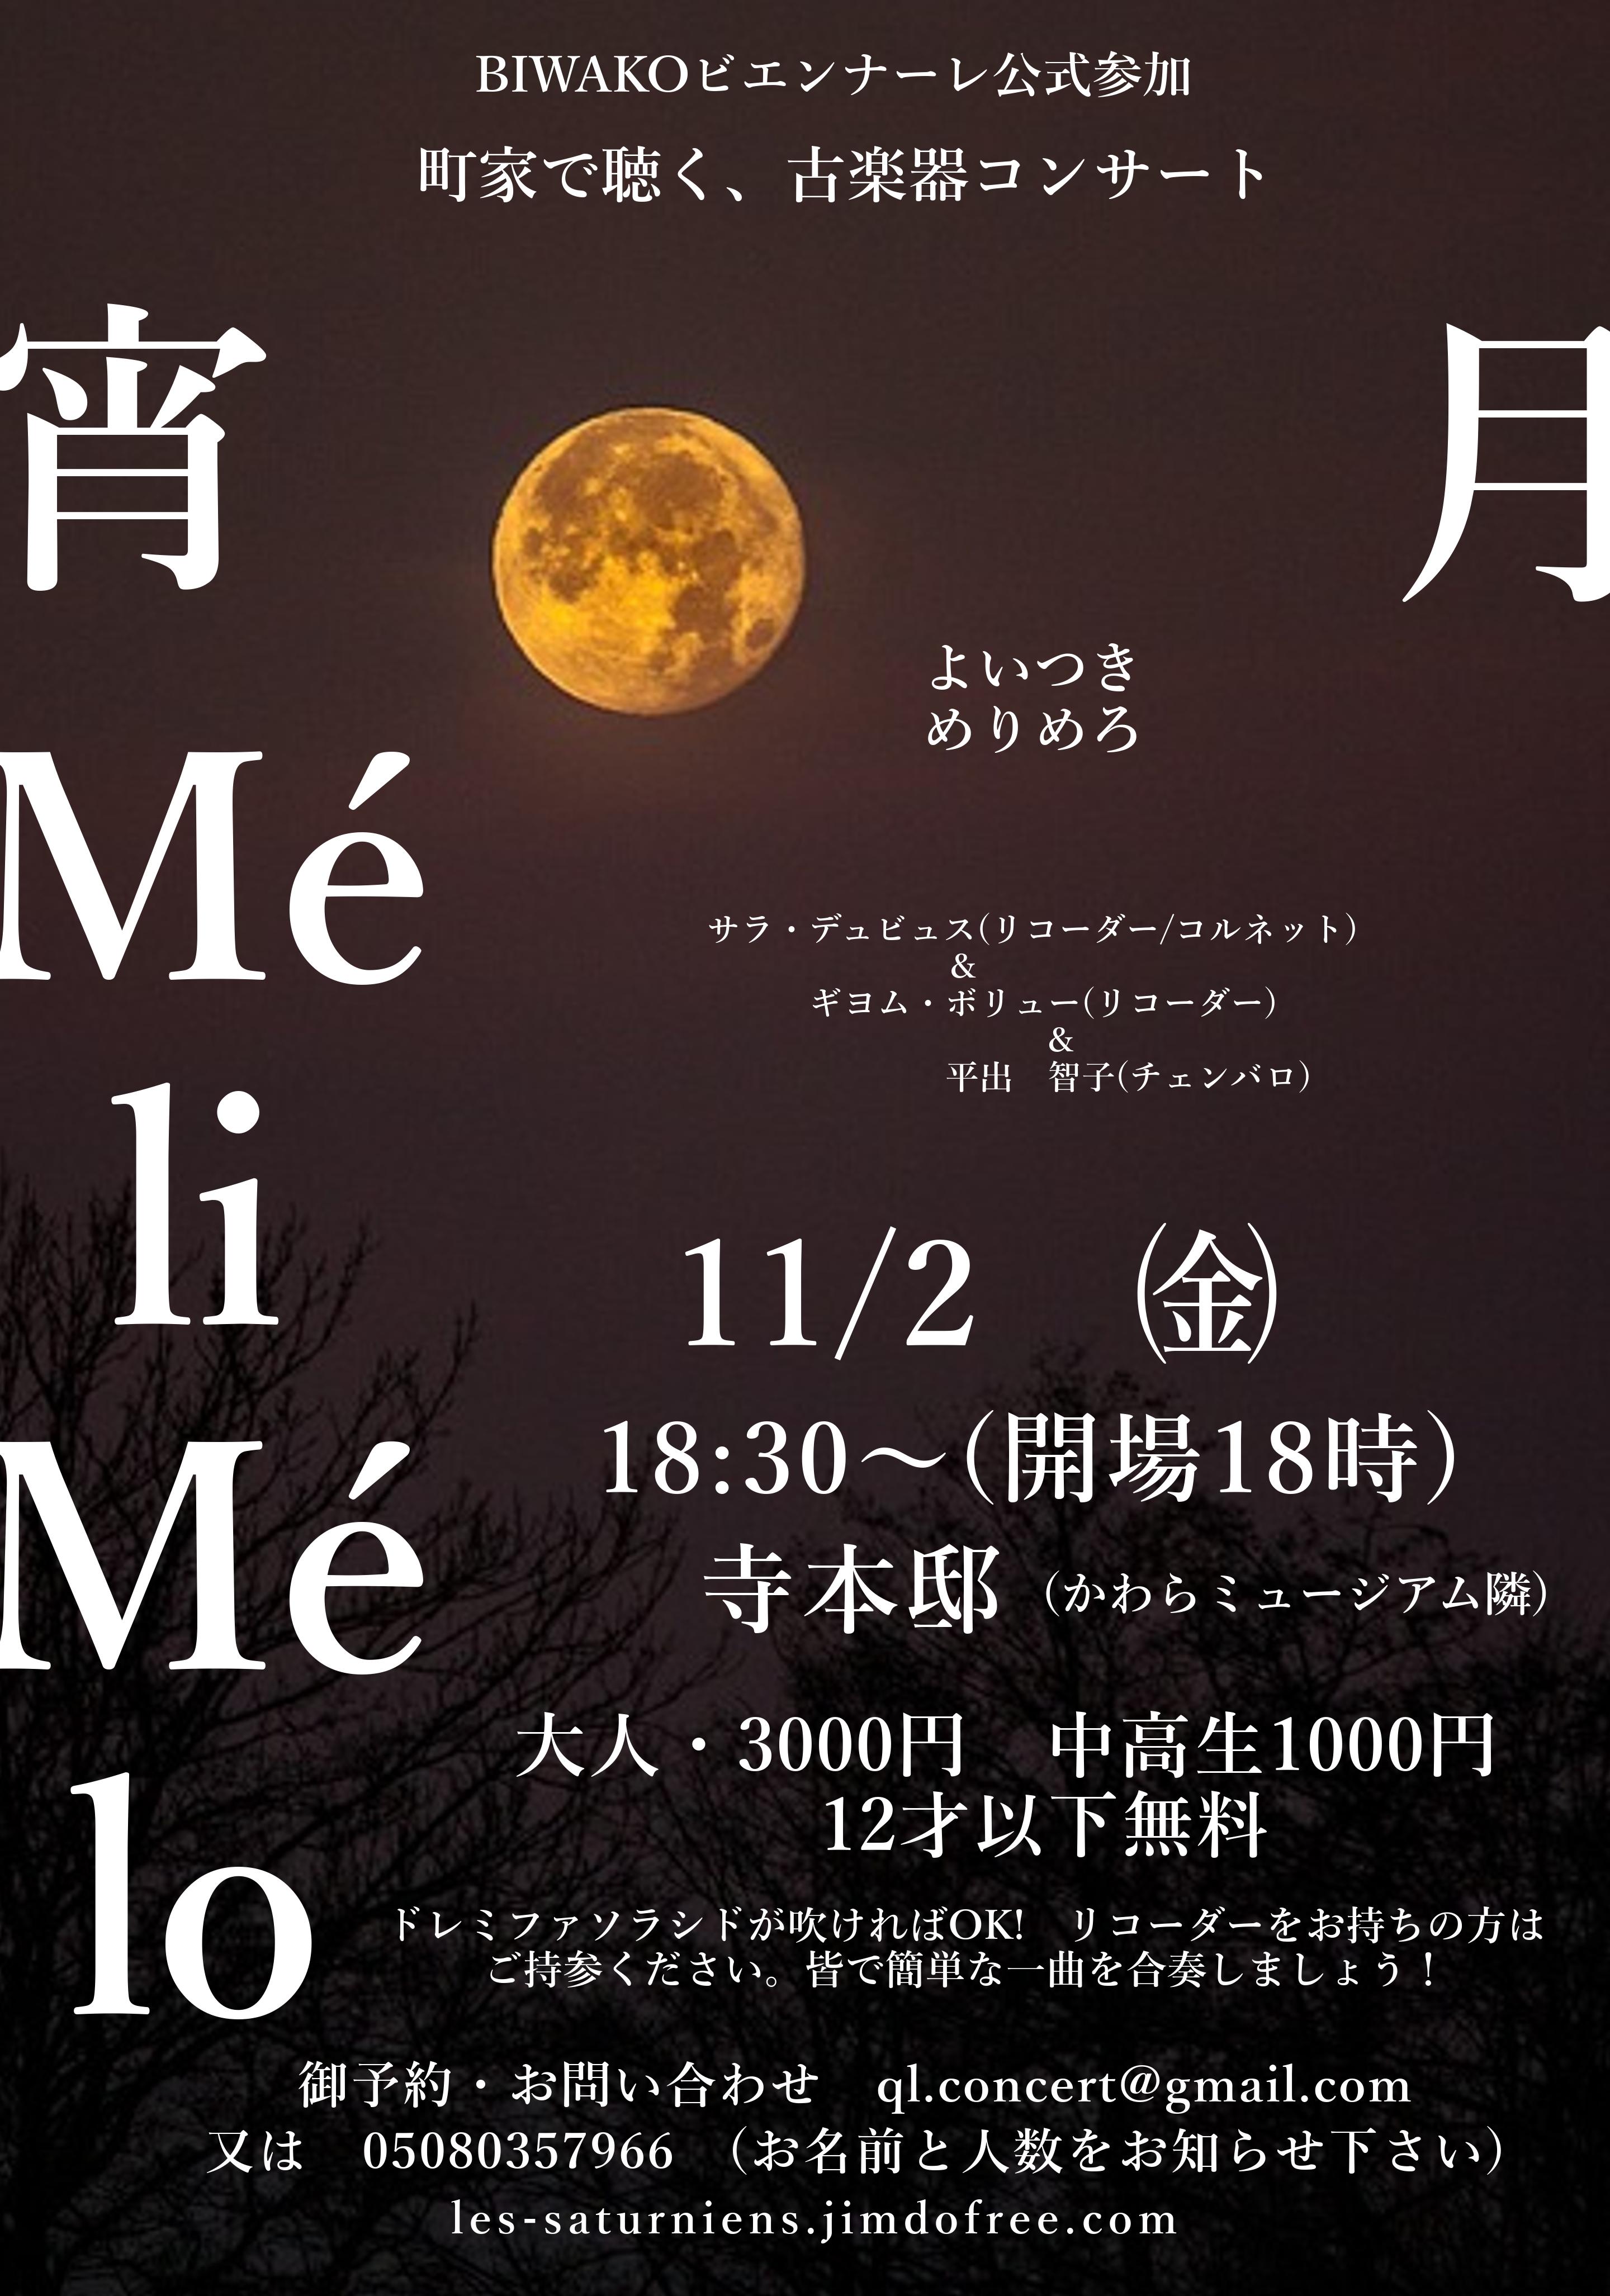 11月2日(金)コンサート「宵月 Mé li Mé lo」